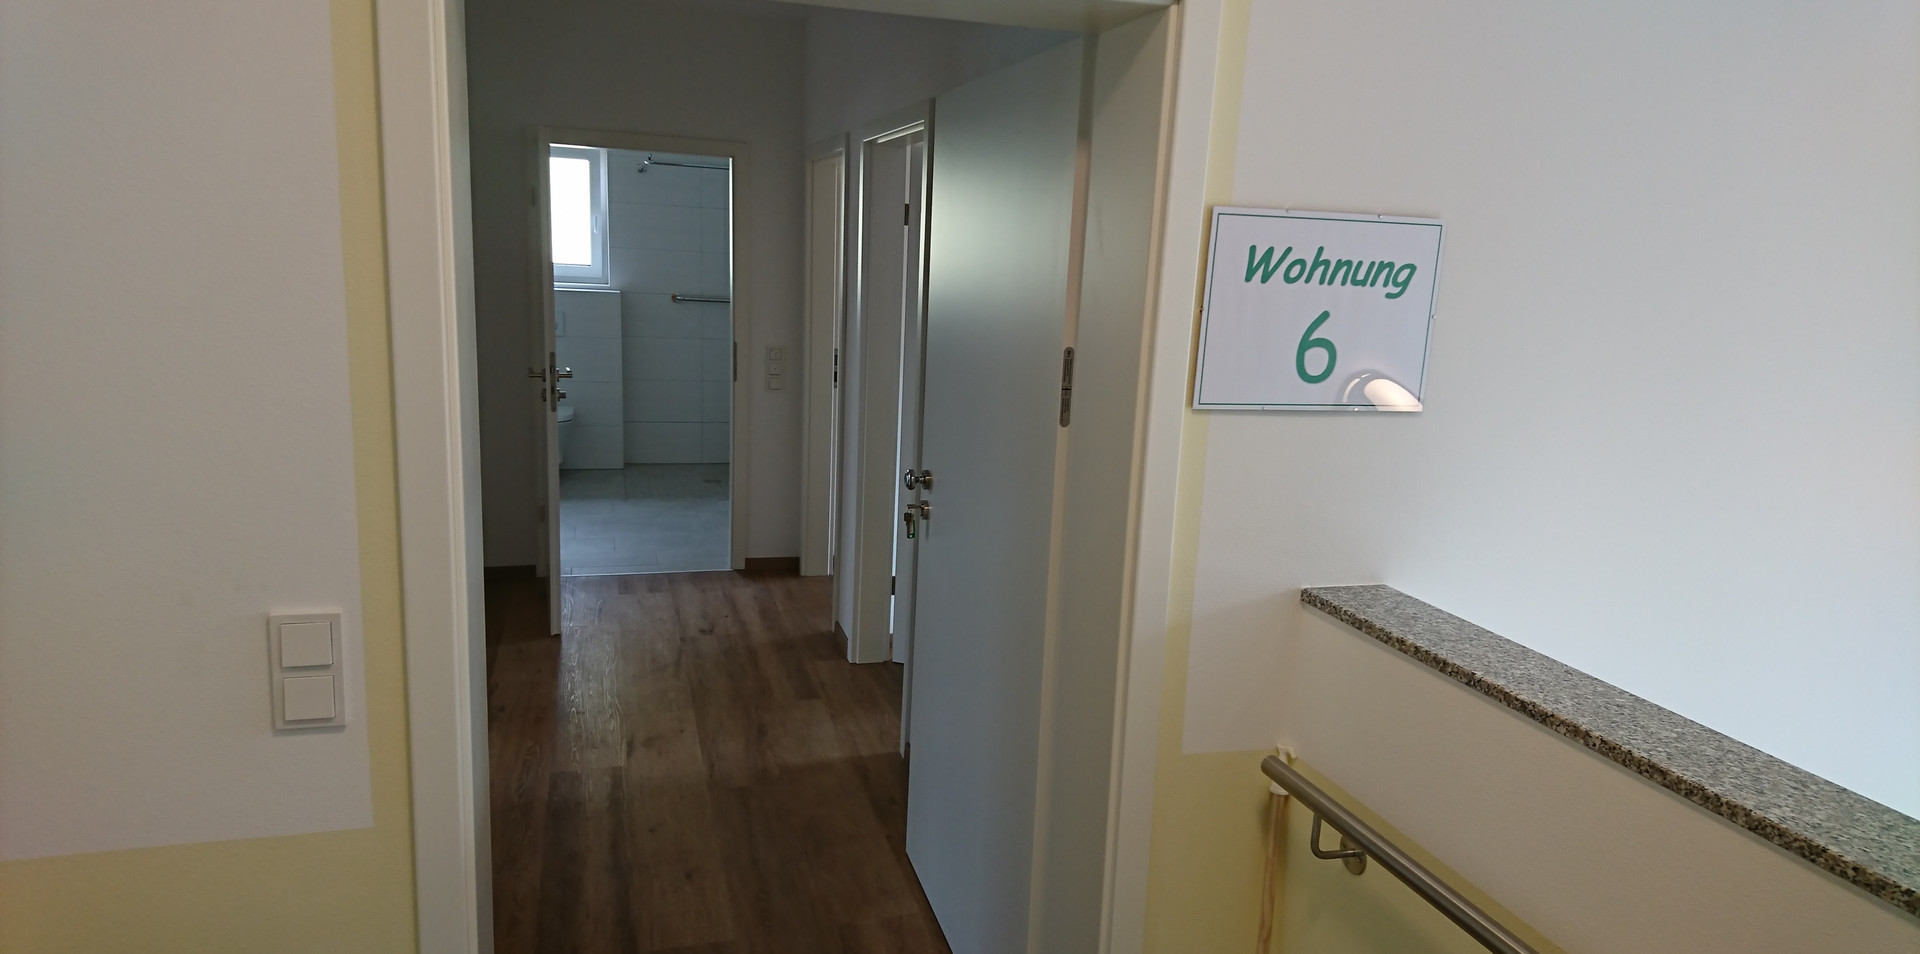 Blick in Wohnung 6